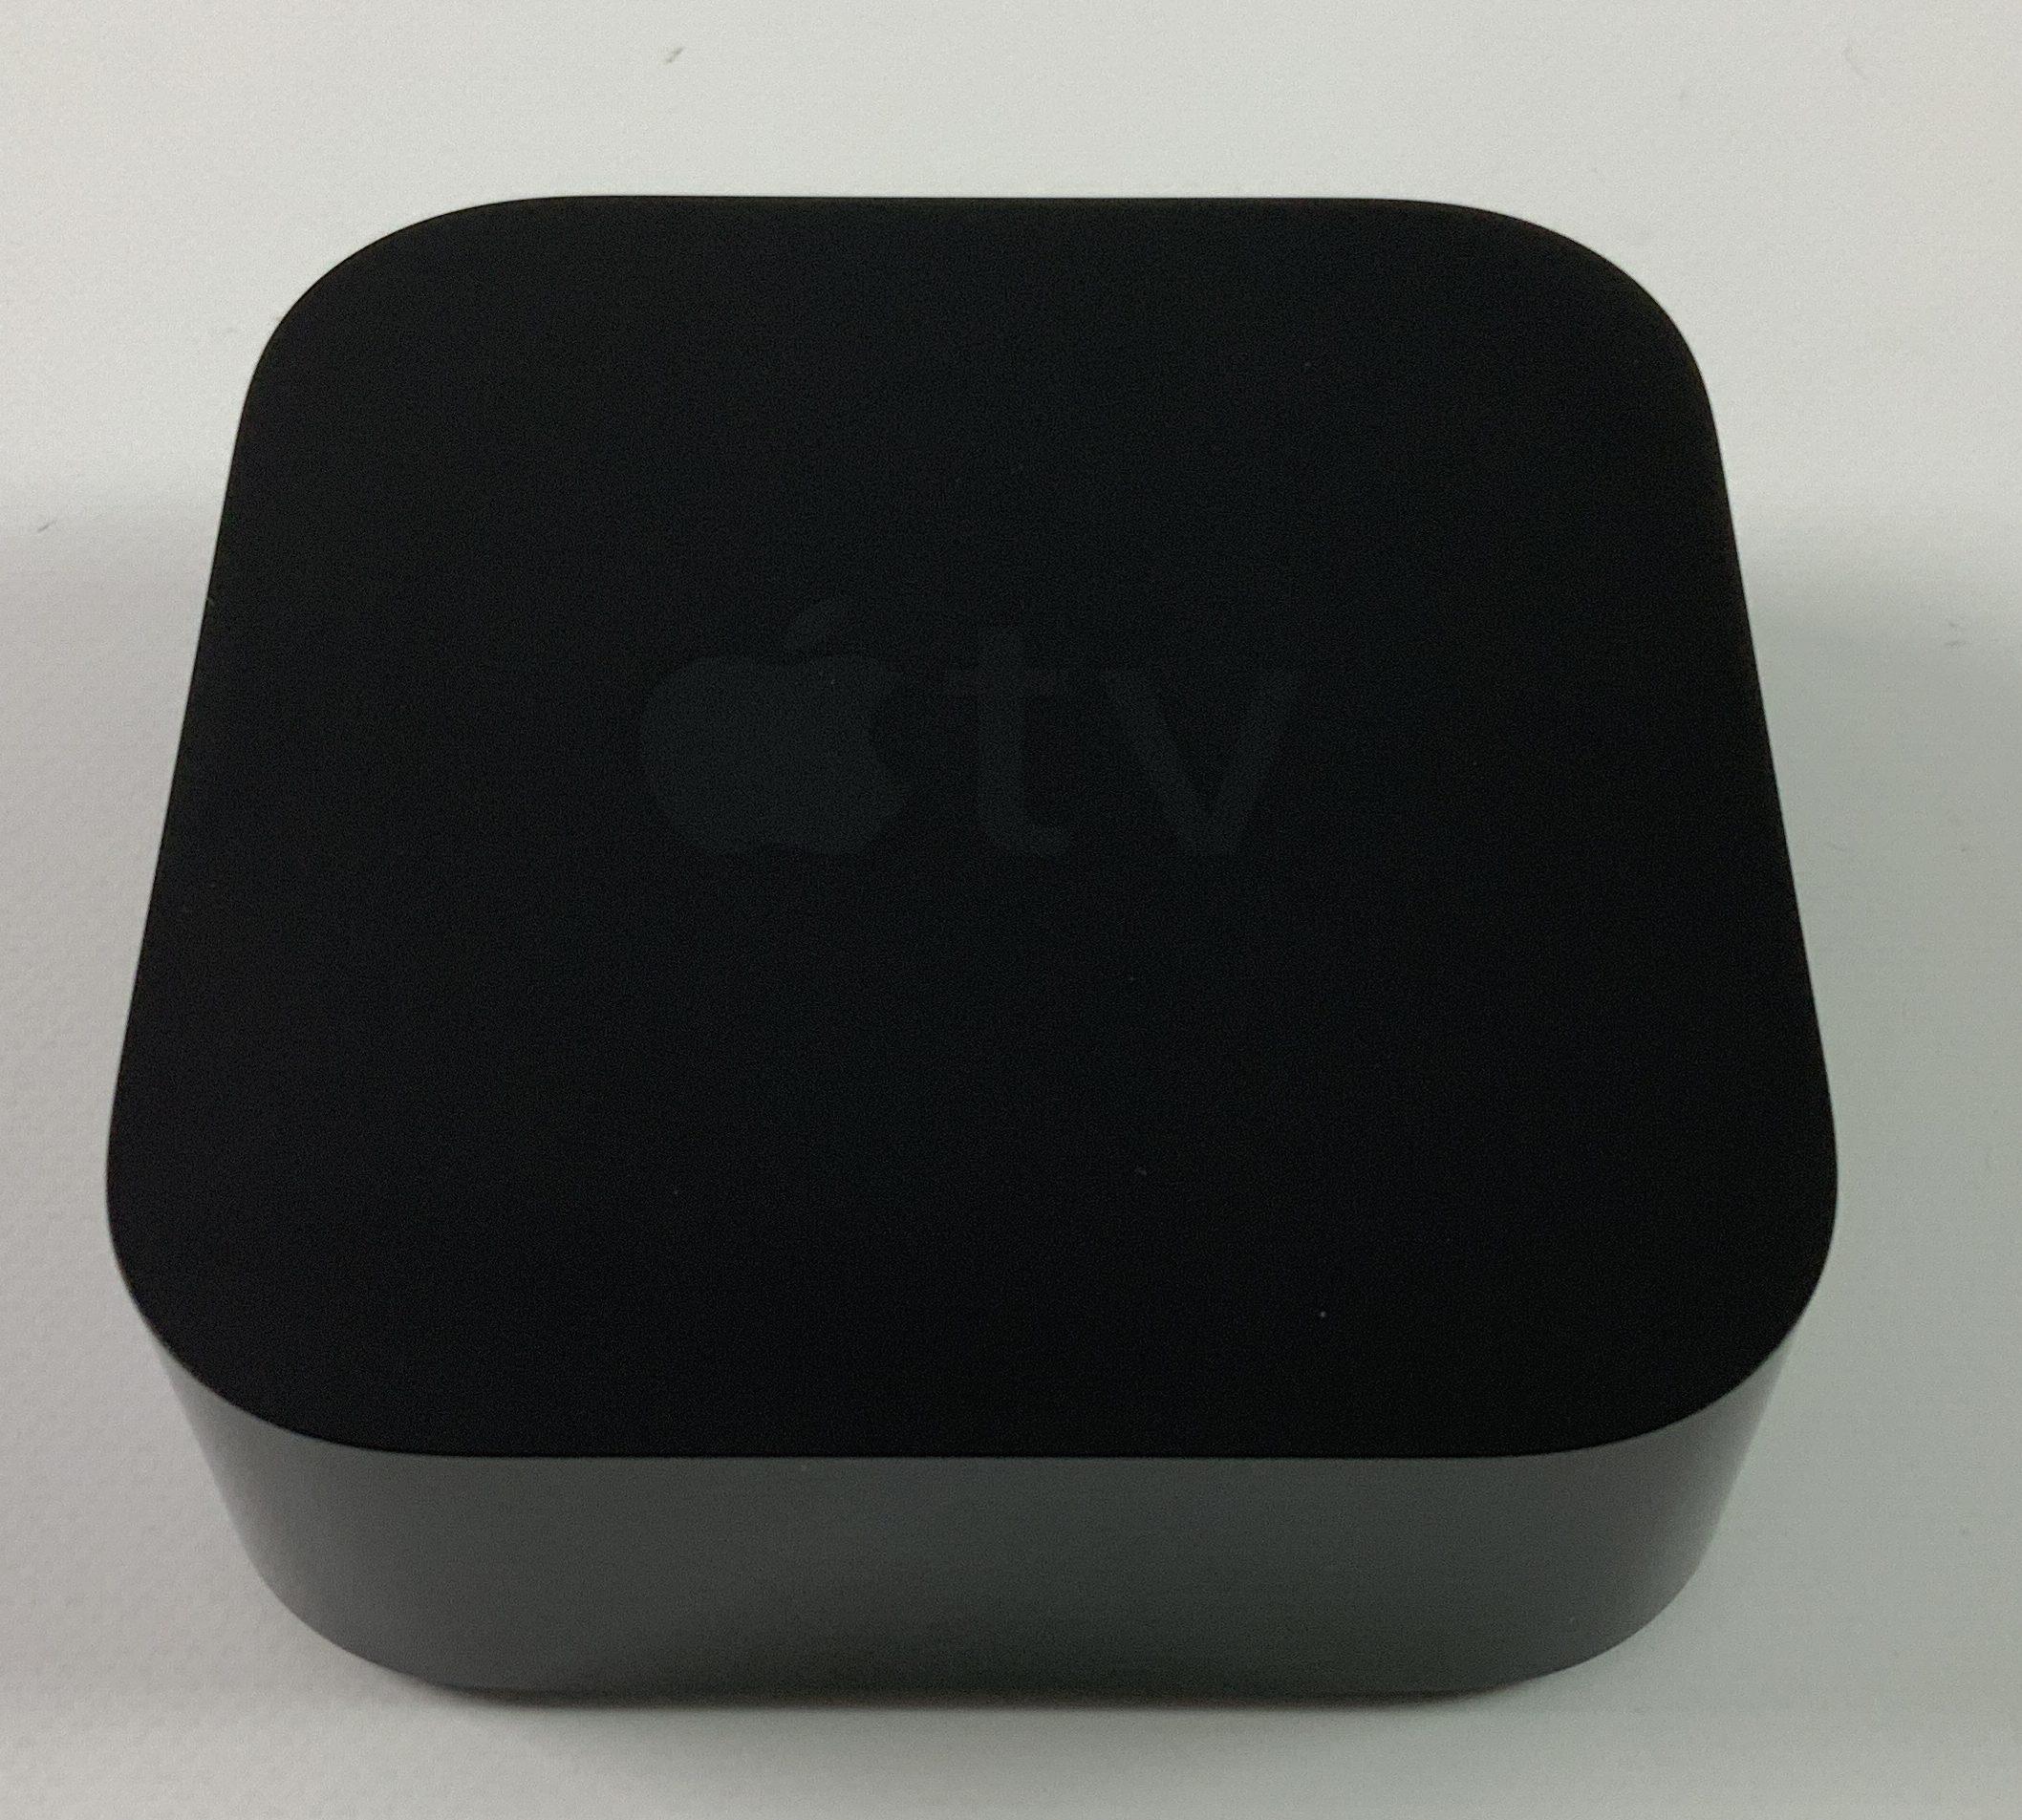 Apple TV 4K (2nd Gen) (64 GB), 64 GB, bild 1